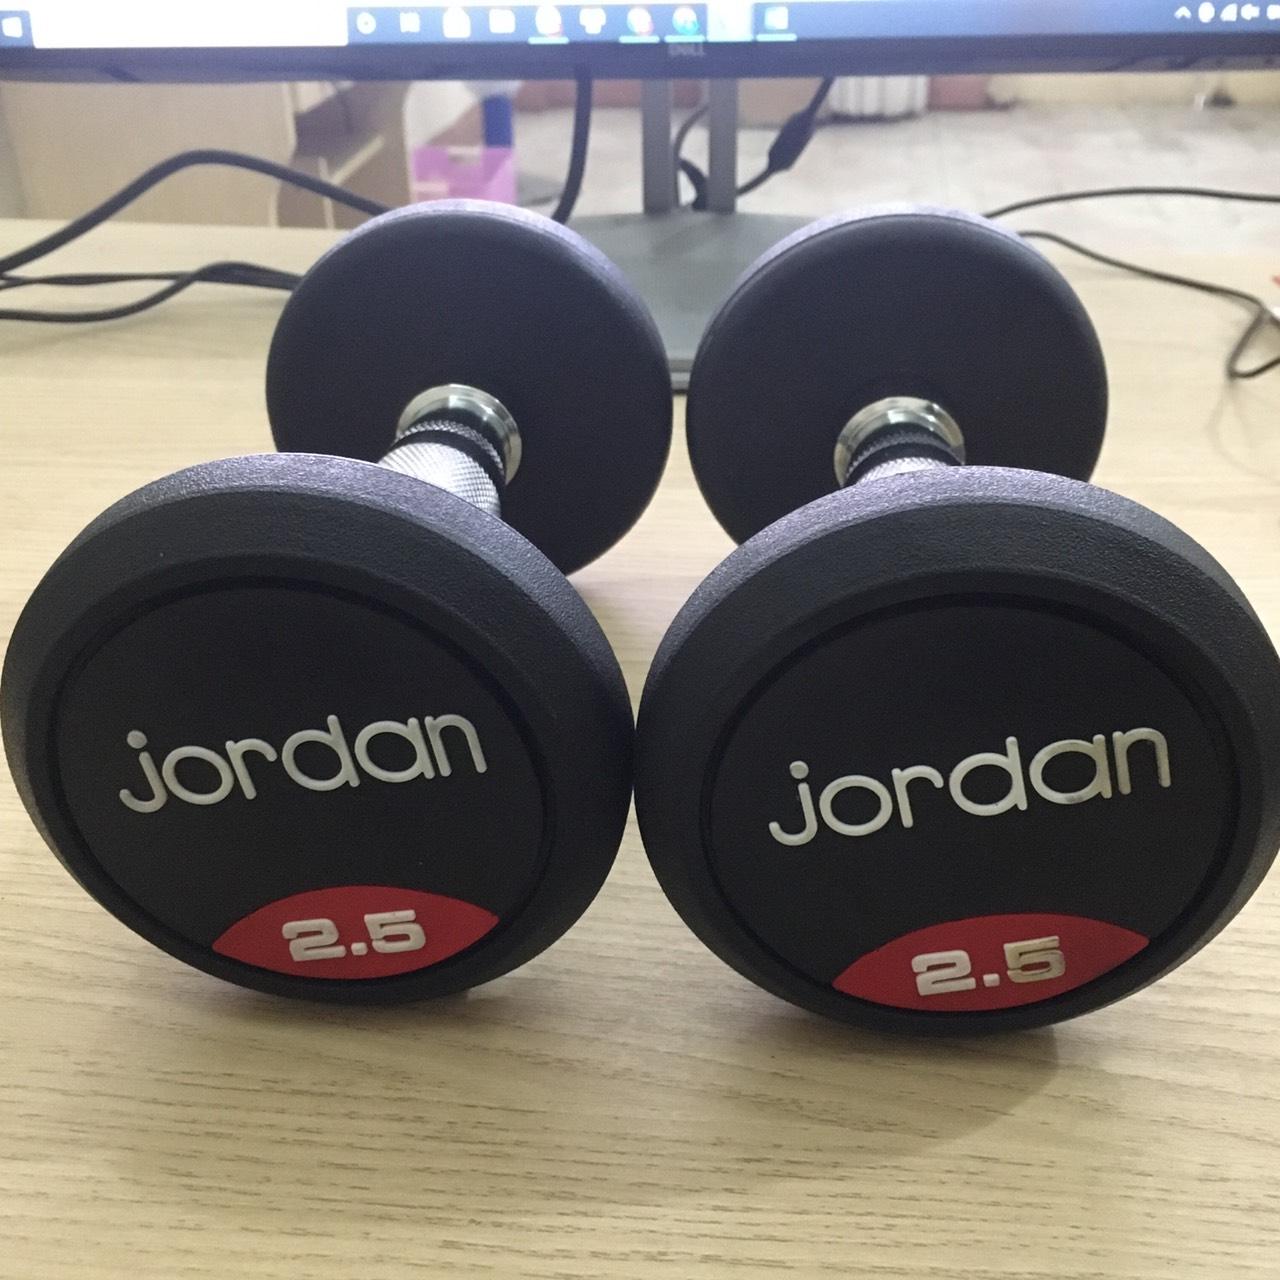 tạ jordan